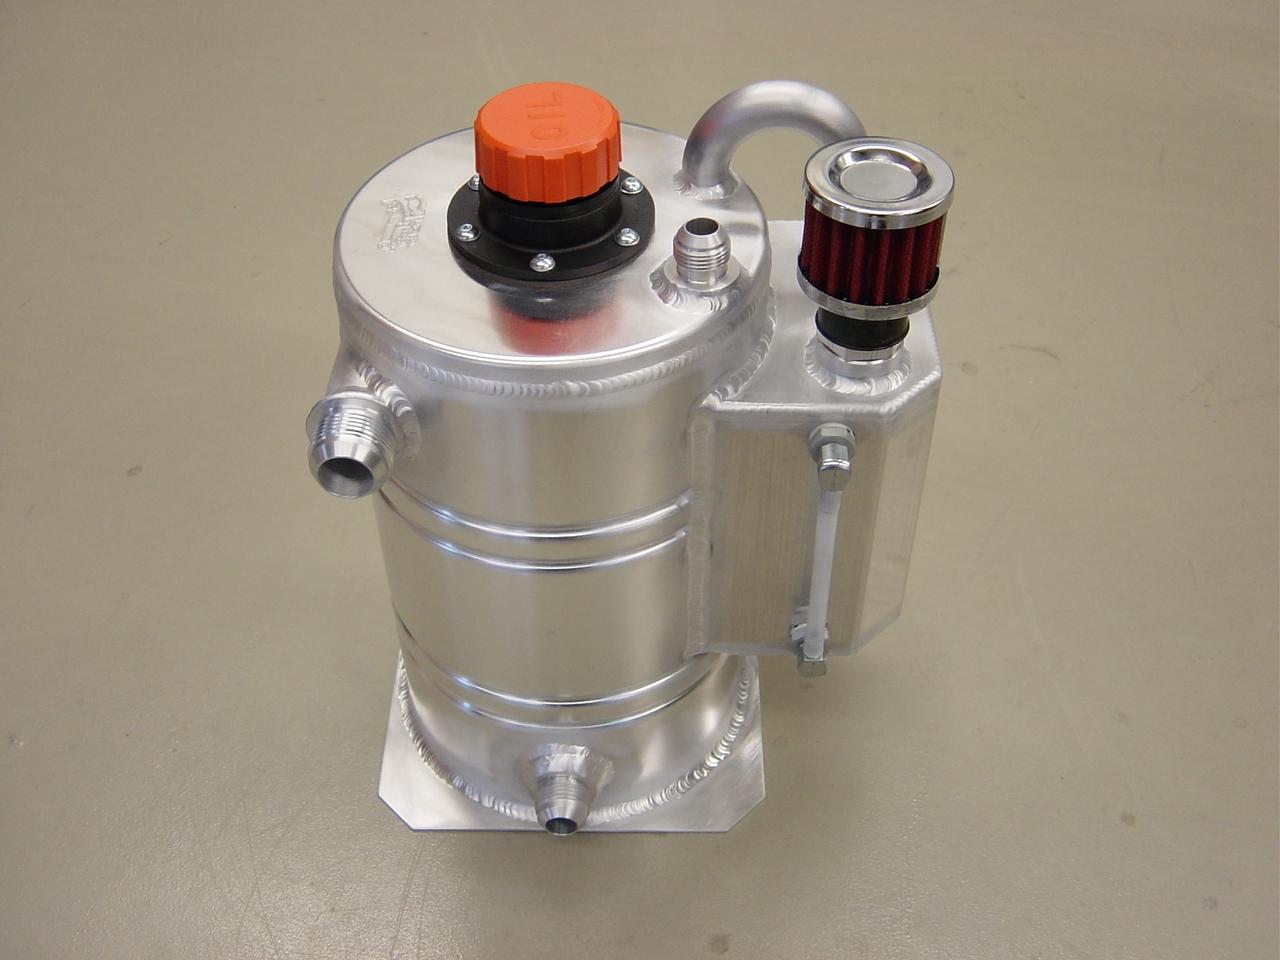 Dry-sump tank 8 liter speciaal - L - Dash 16-0